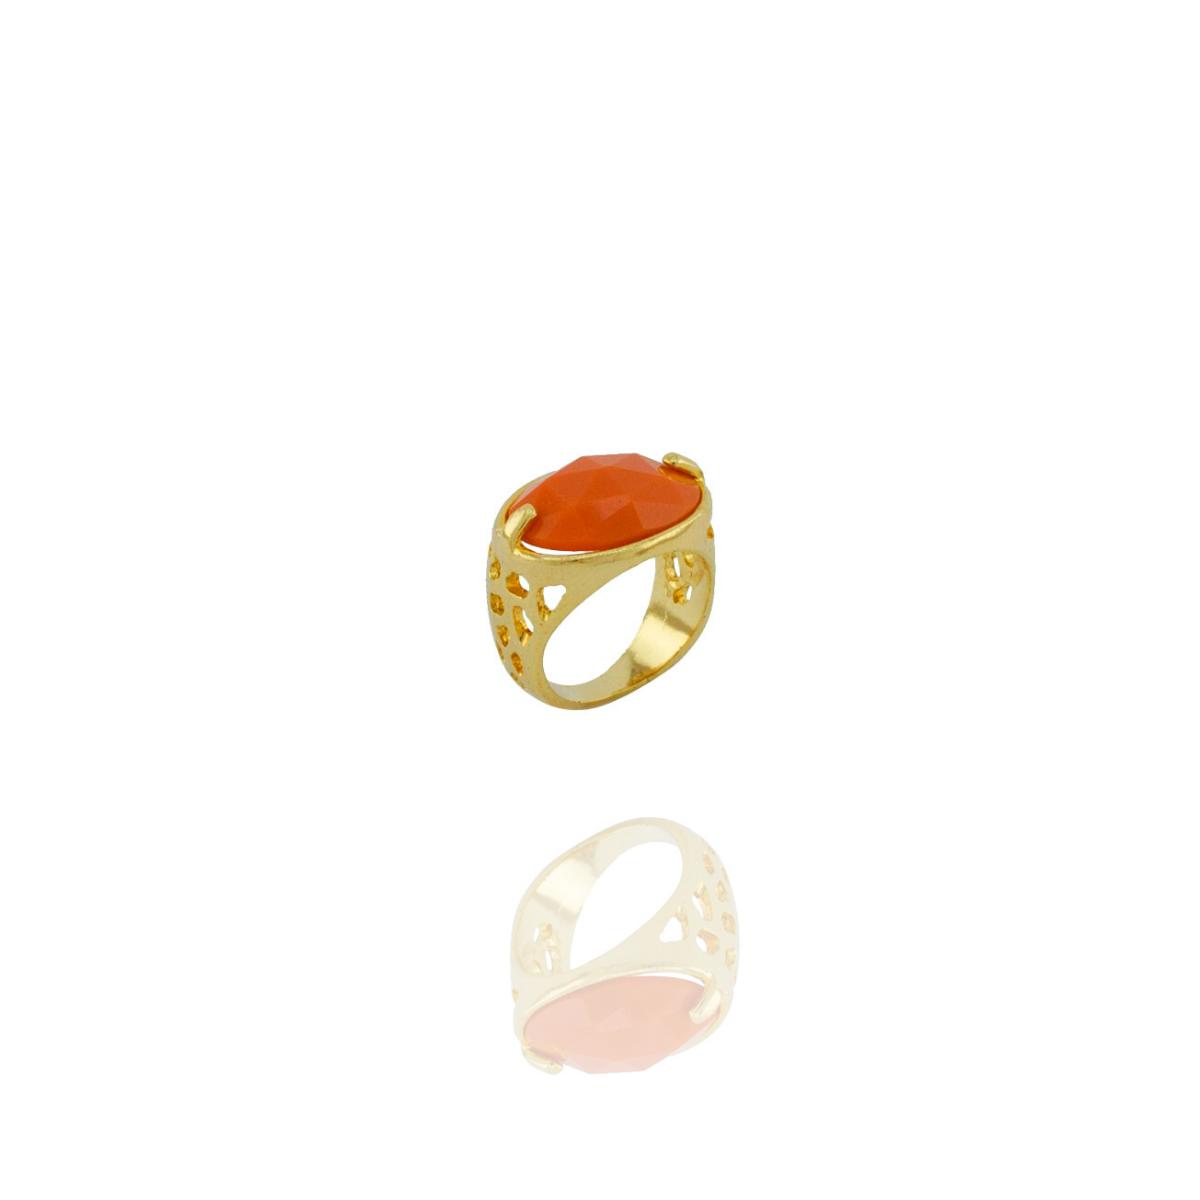 Anel Barbara Strauss Semi Joia Tânger Em Resina Lalique Laranja, Rev. Em Ouro Amarelo 18K